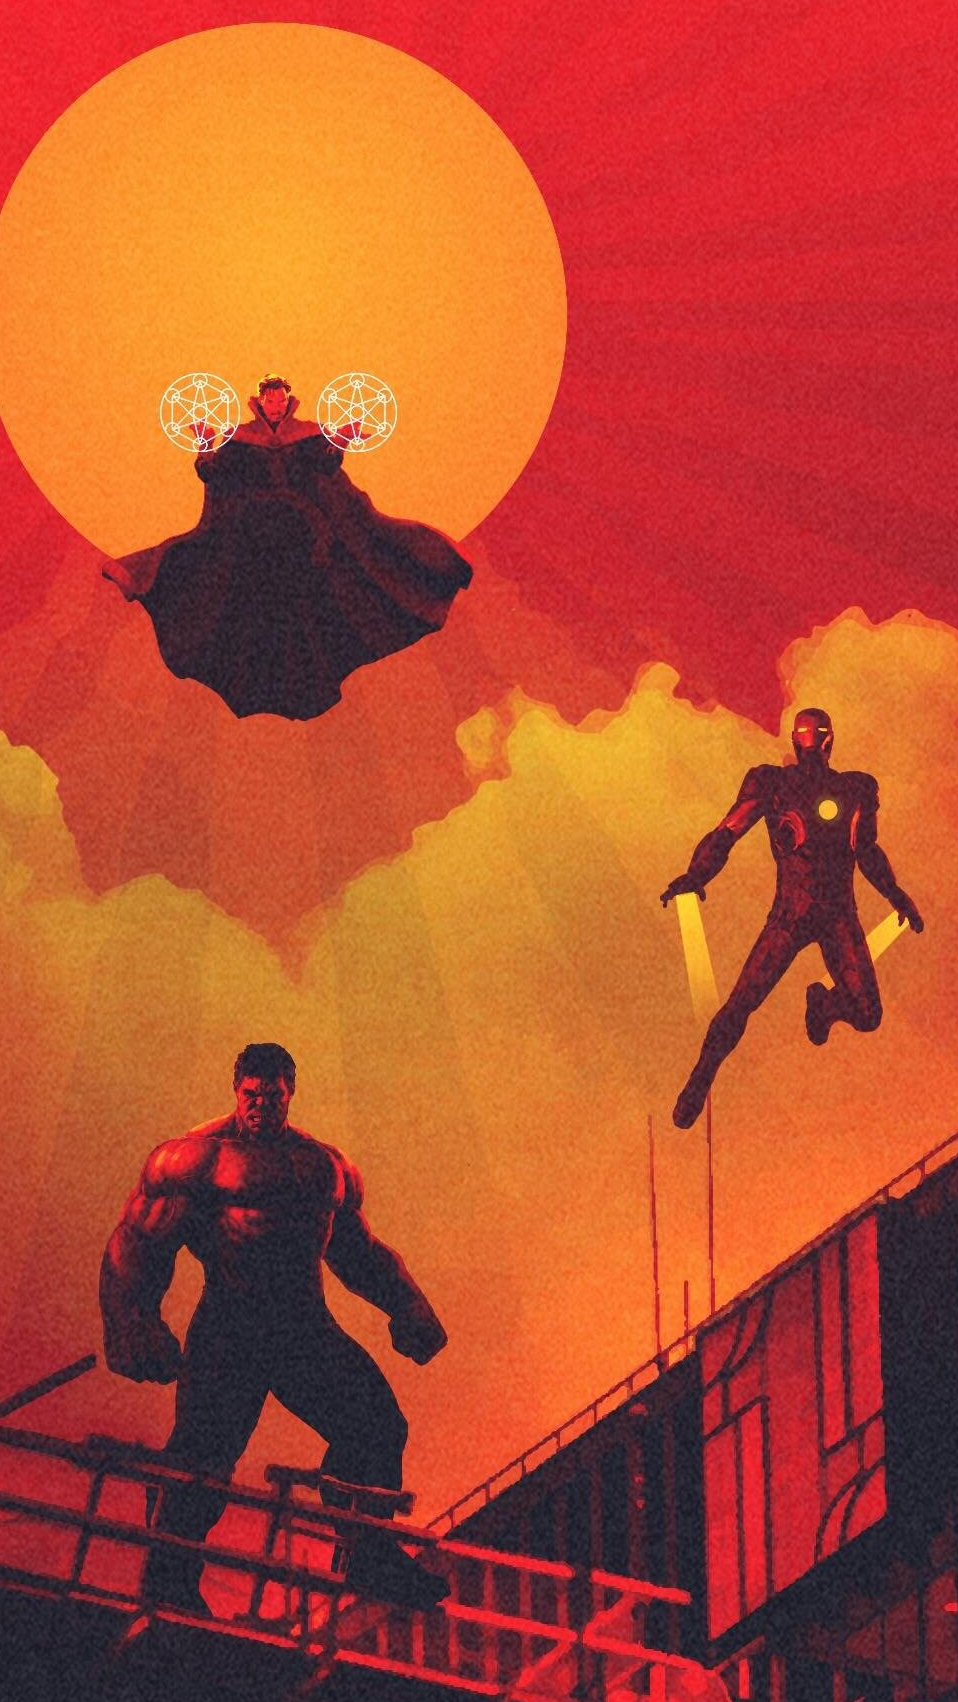 Download Wallpaper Spiderman Hd Avengers Infinity War 2018 Iphone Wallpaper Iphone